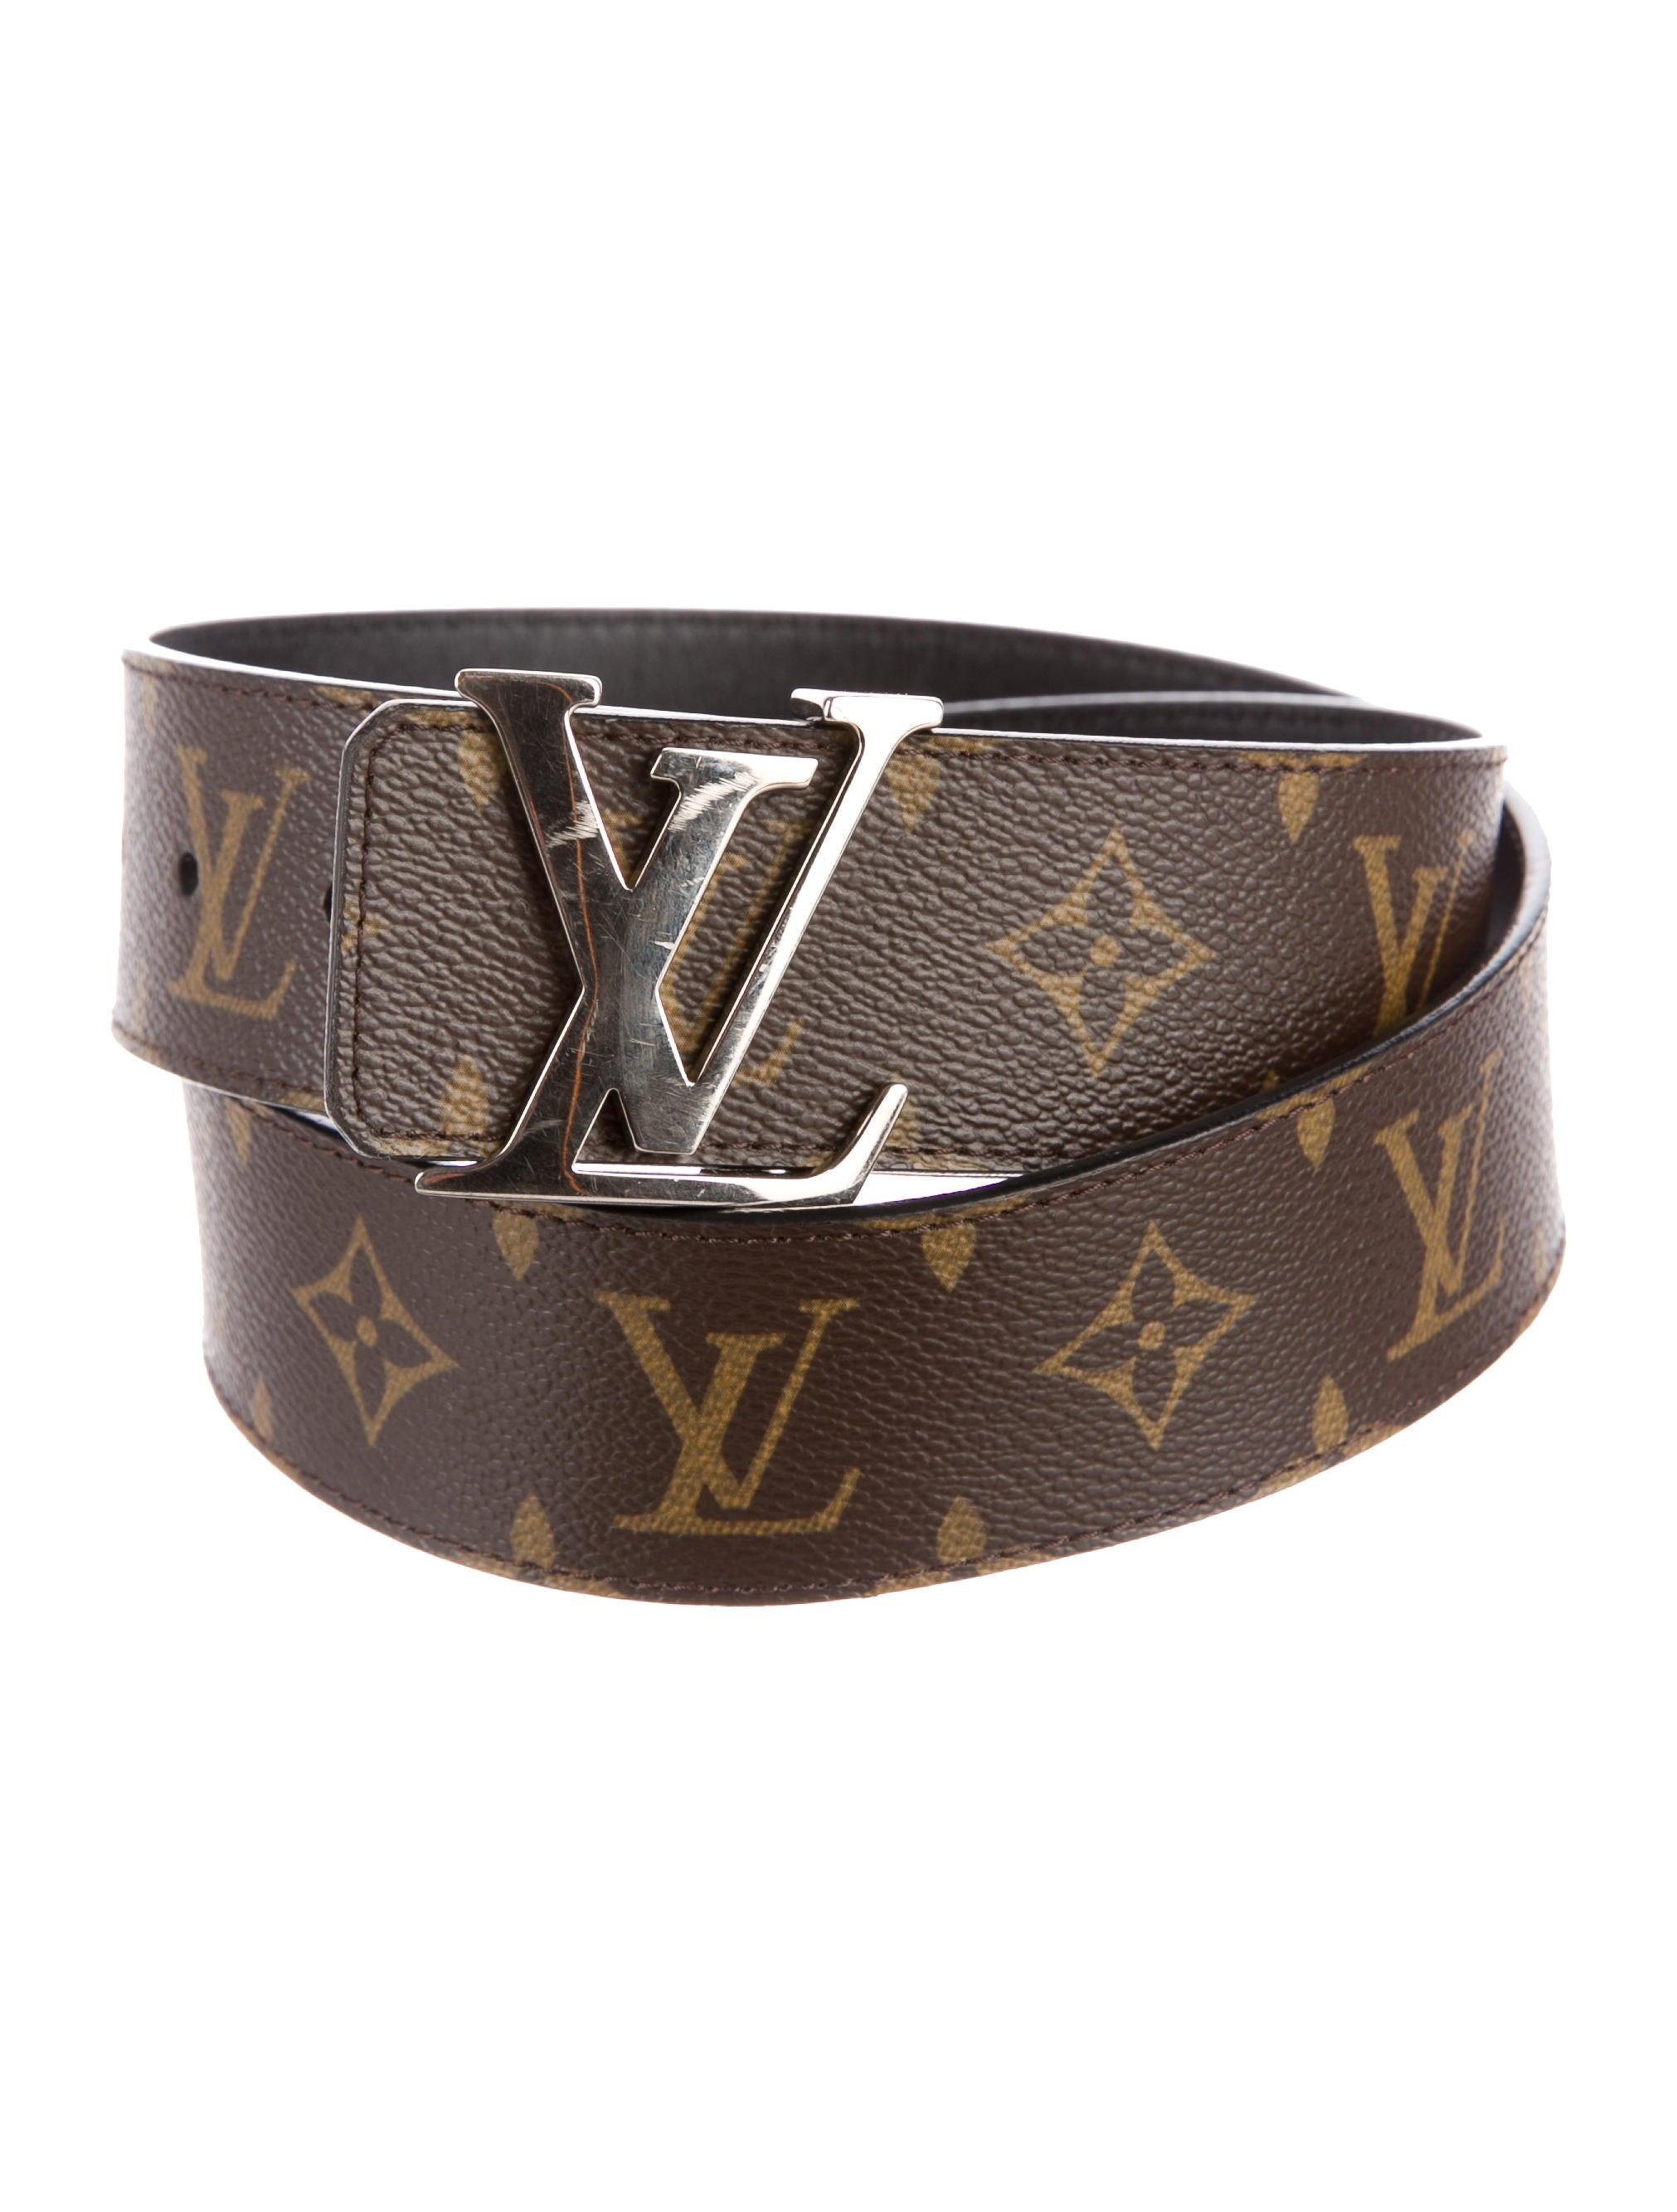 Louis Vuitton Initiales 40mm Reversible Belt Accessories